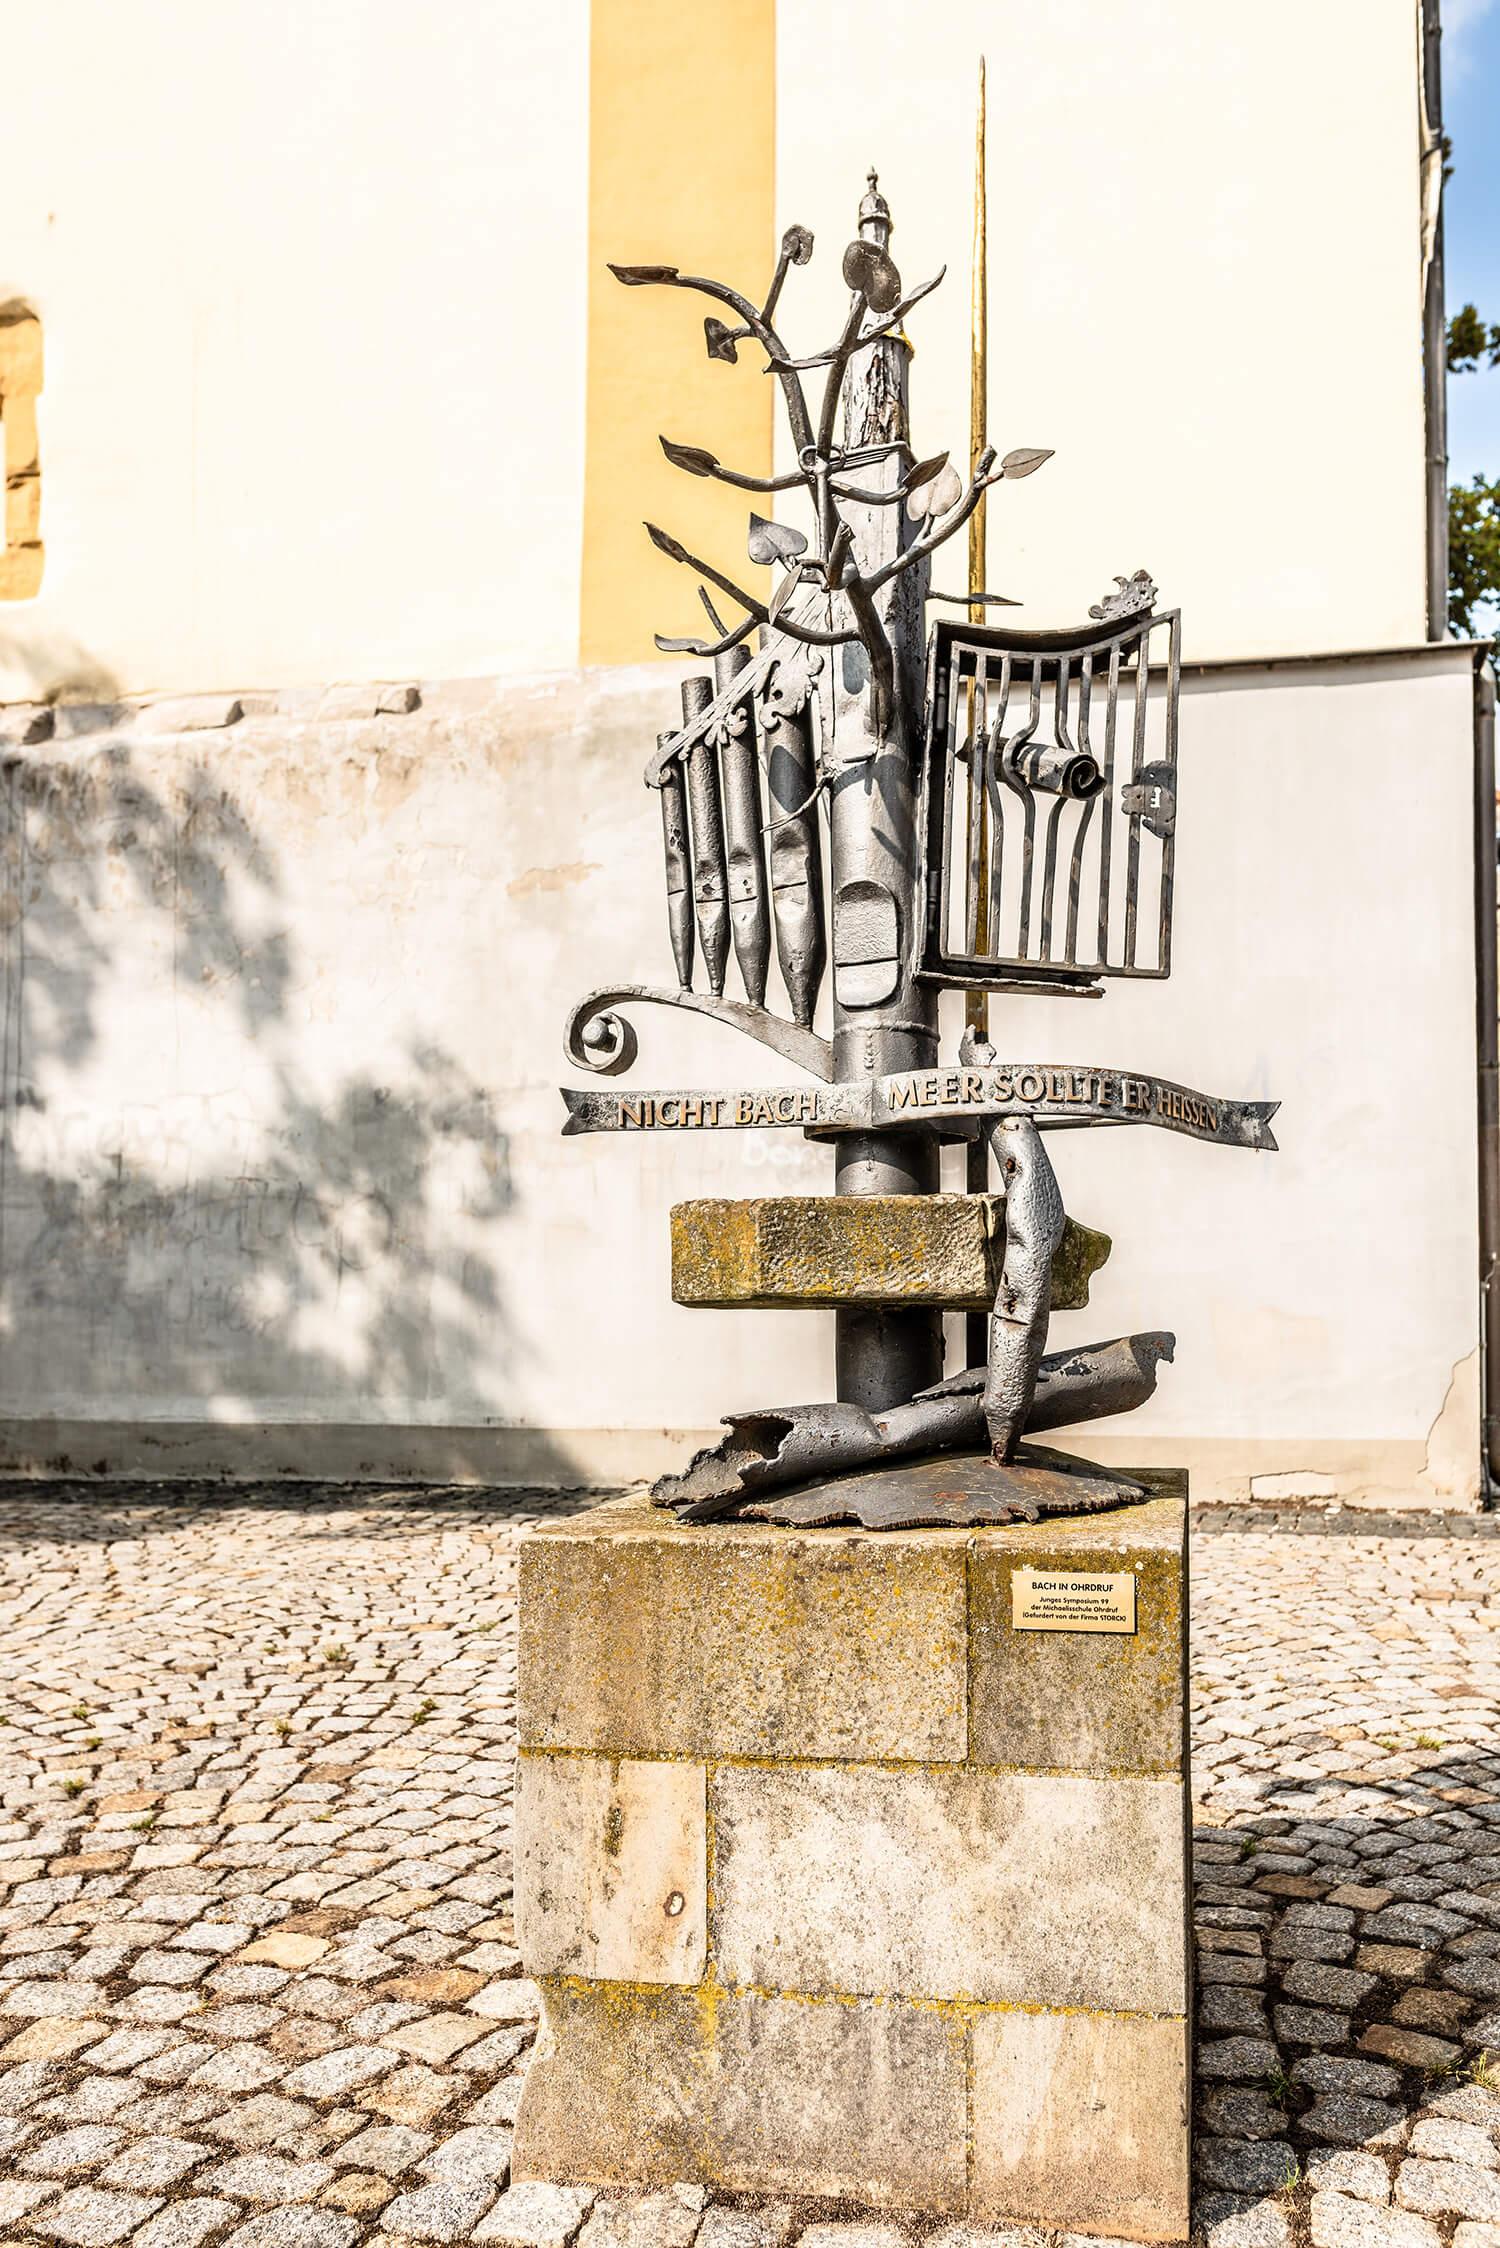 Bachdenkmal/Clemens Bauerfeind